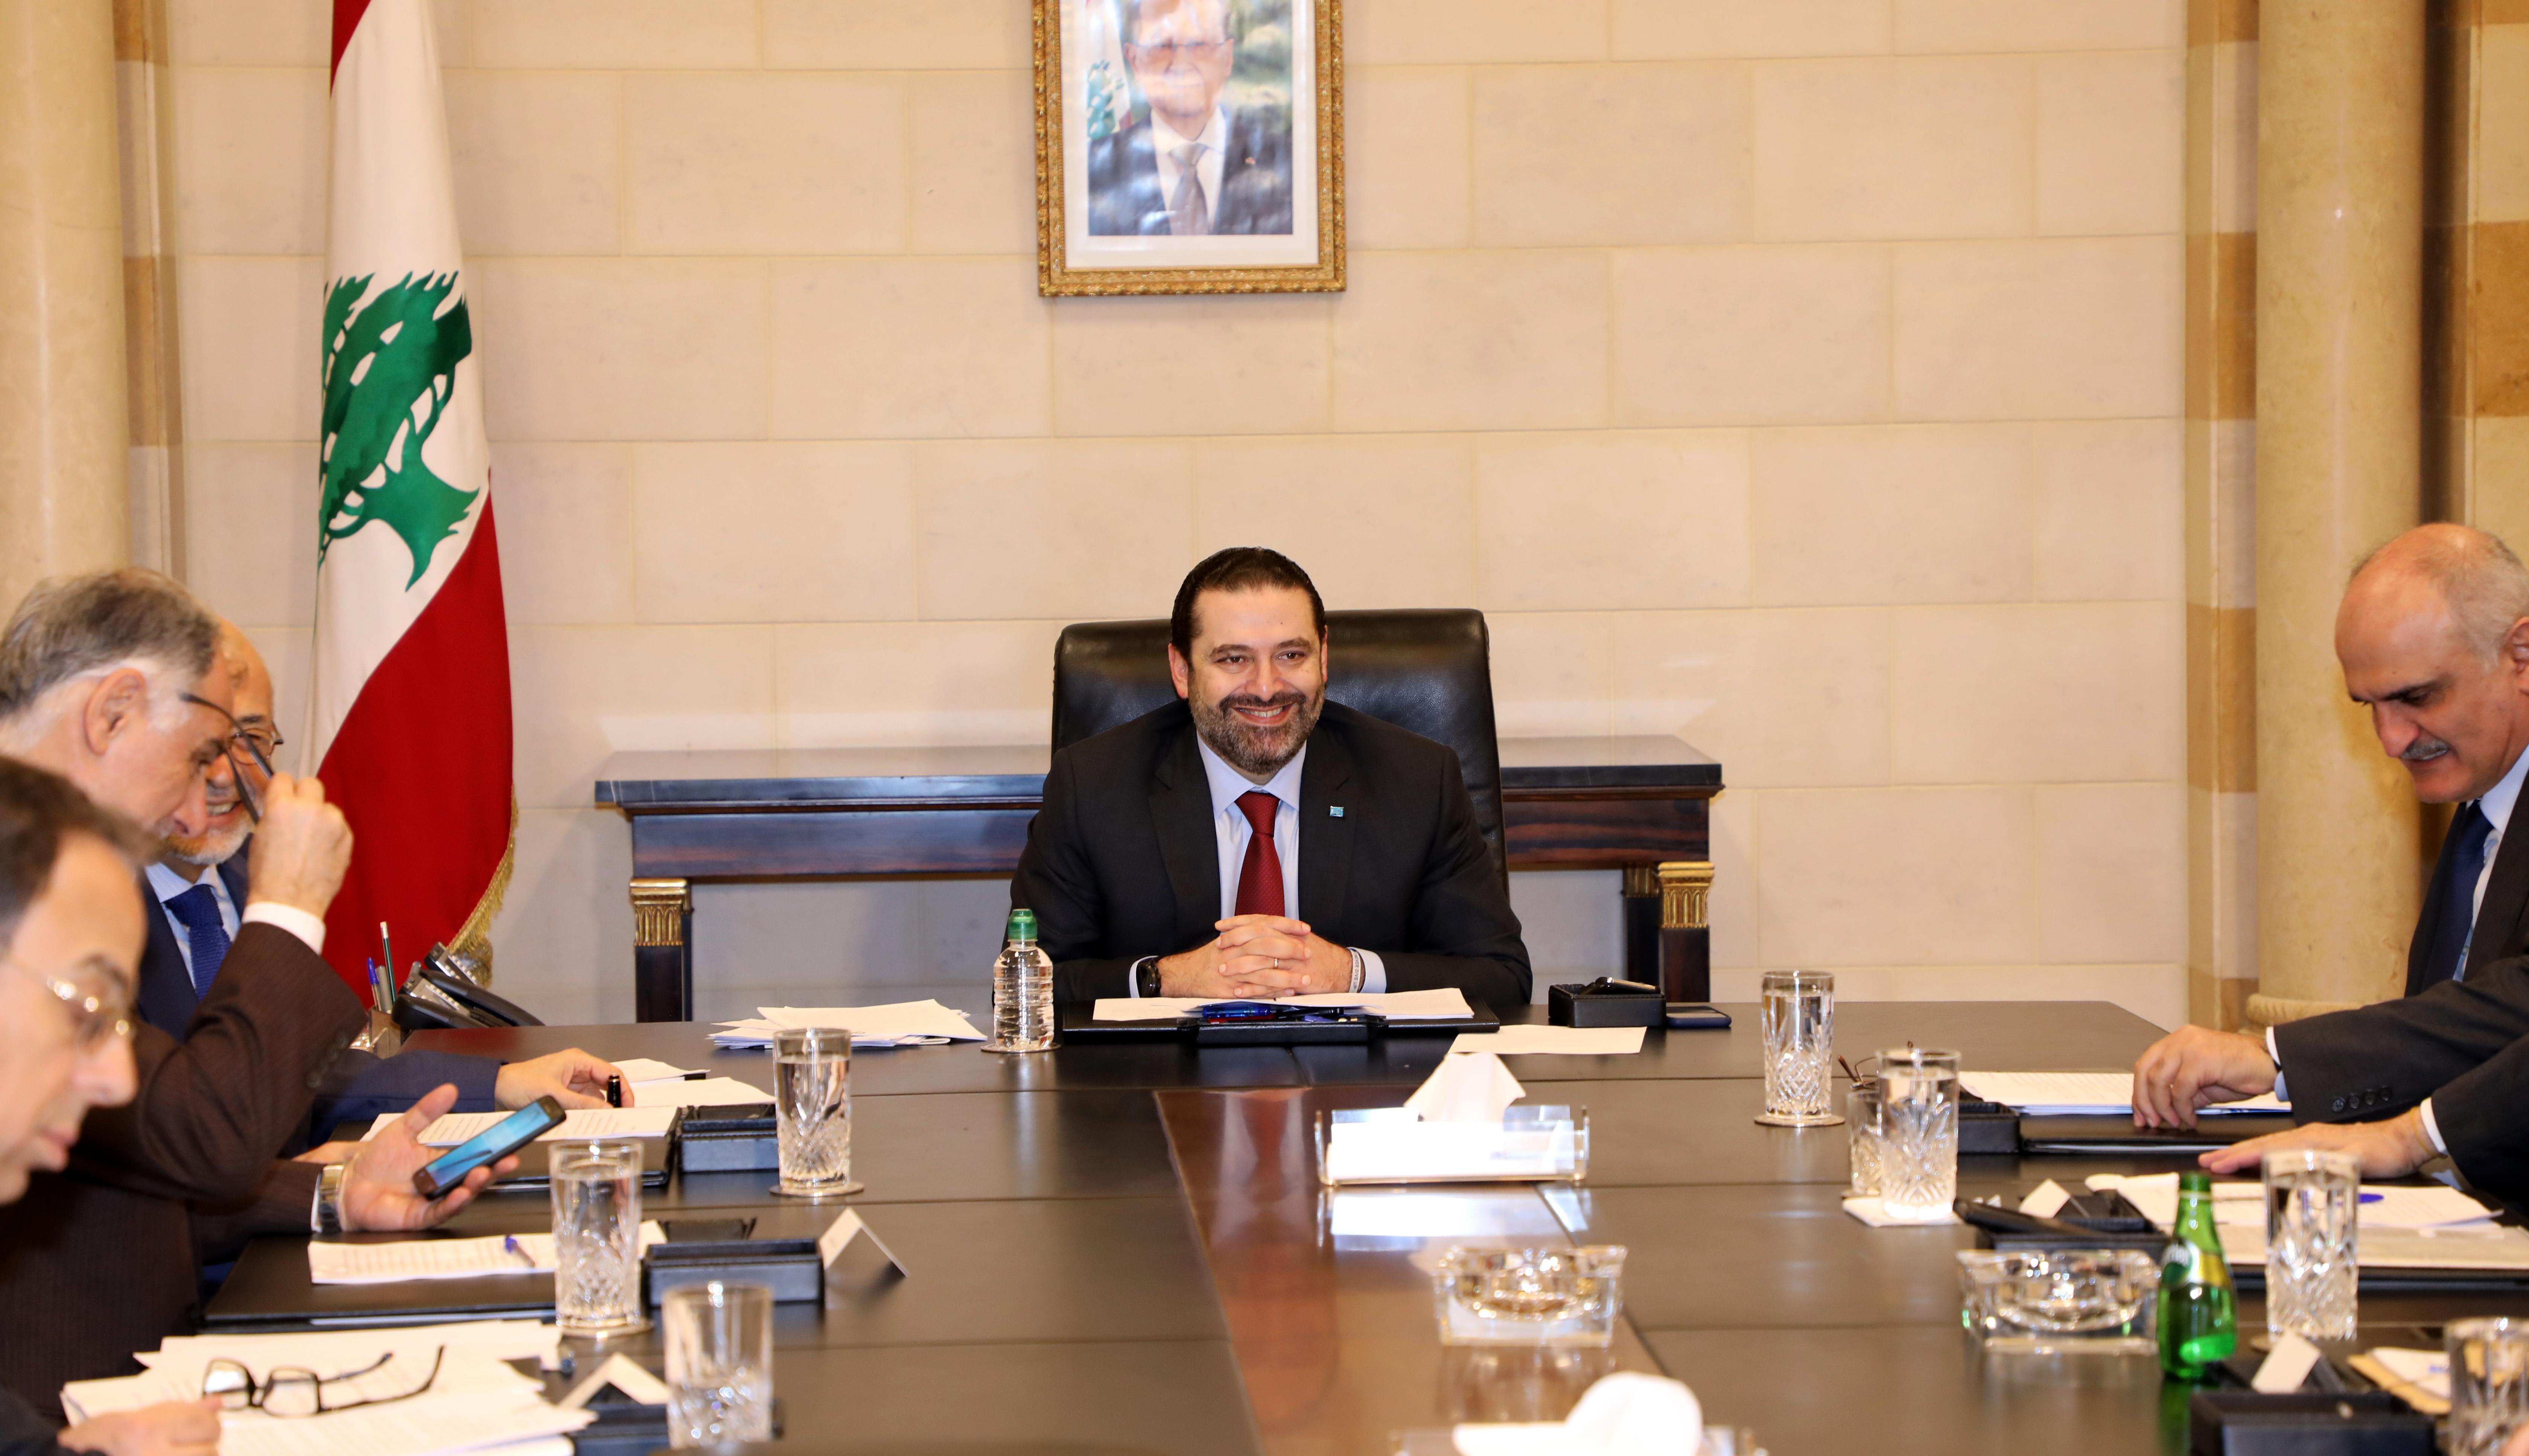 Pr Minister Saad Hariri Heading a Ministerial Cpuncil 2